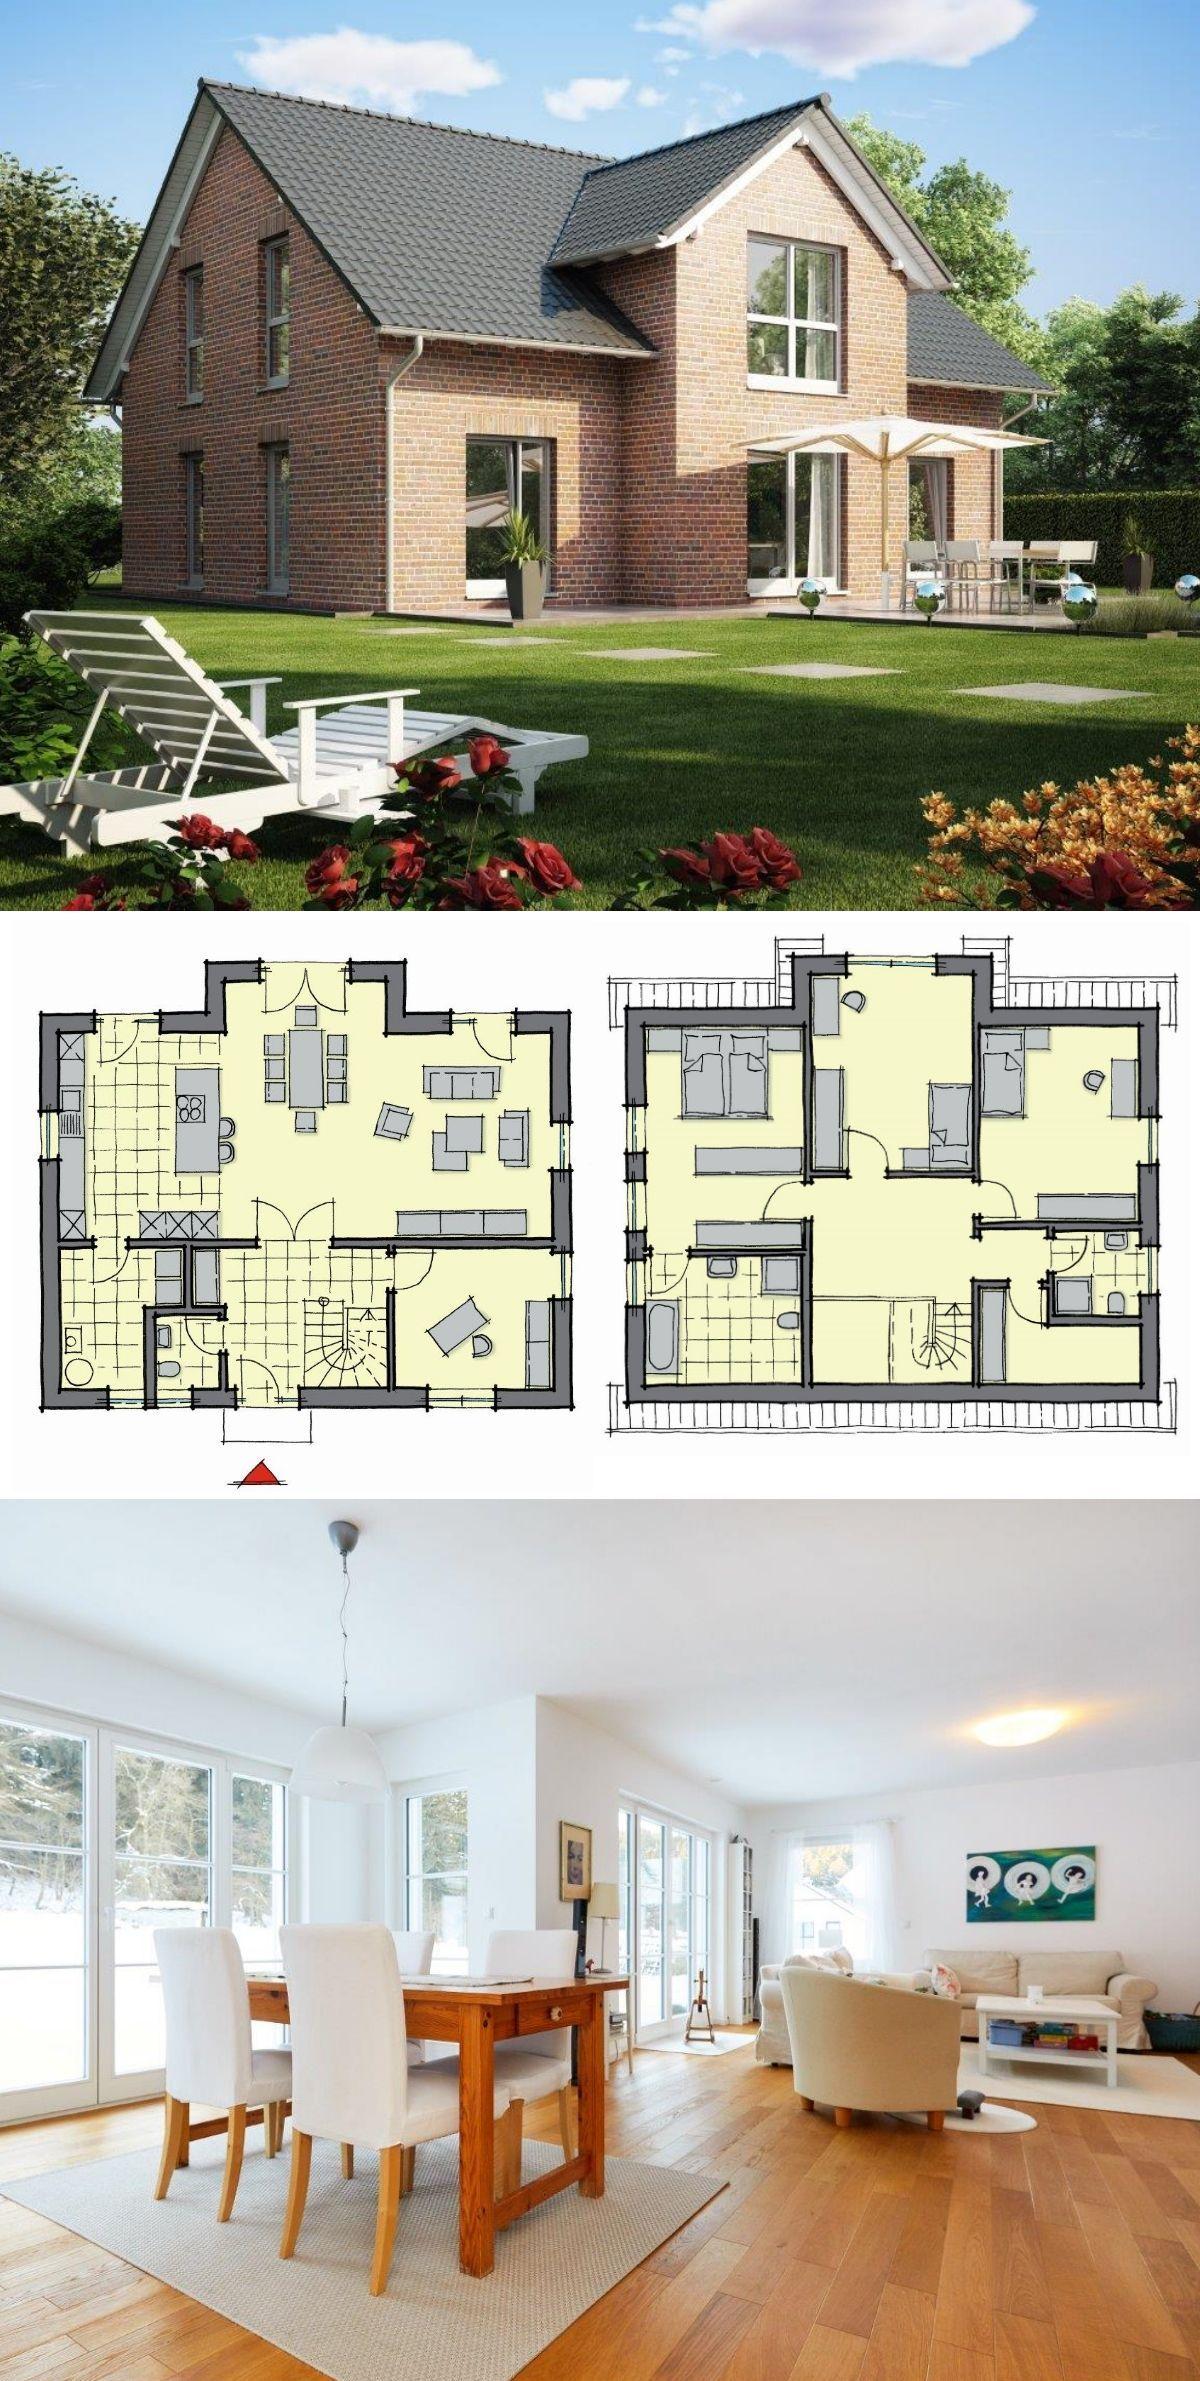 Einfamilienhaus Kiefernallee mit Klinker Fassade GUSSEK HAUS